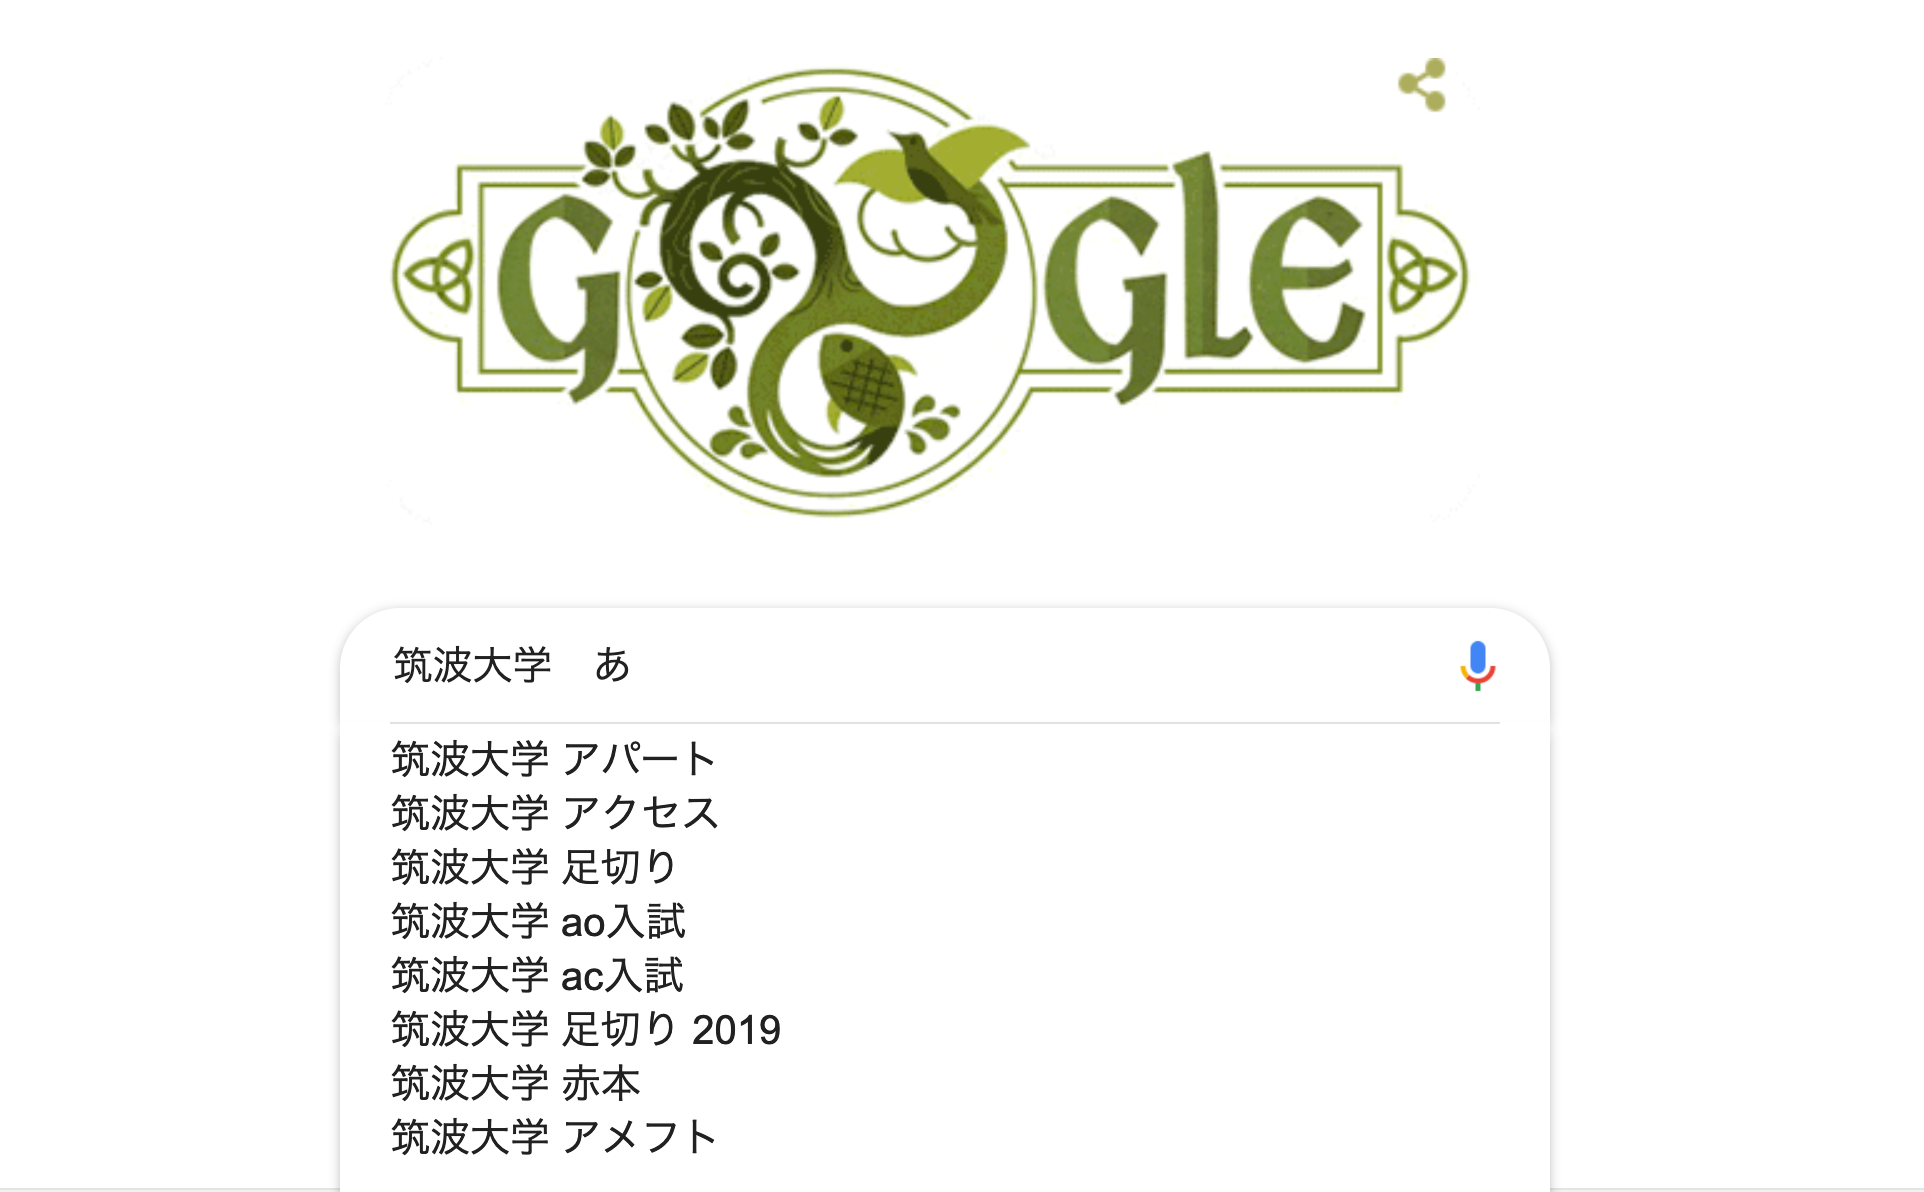 大学 manaba 筑波